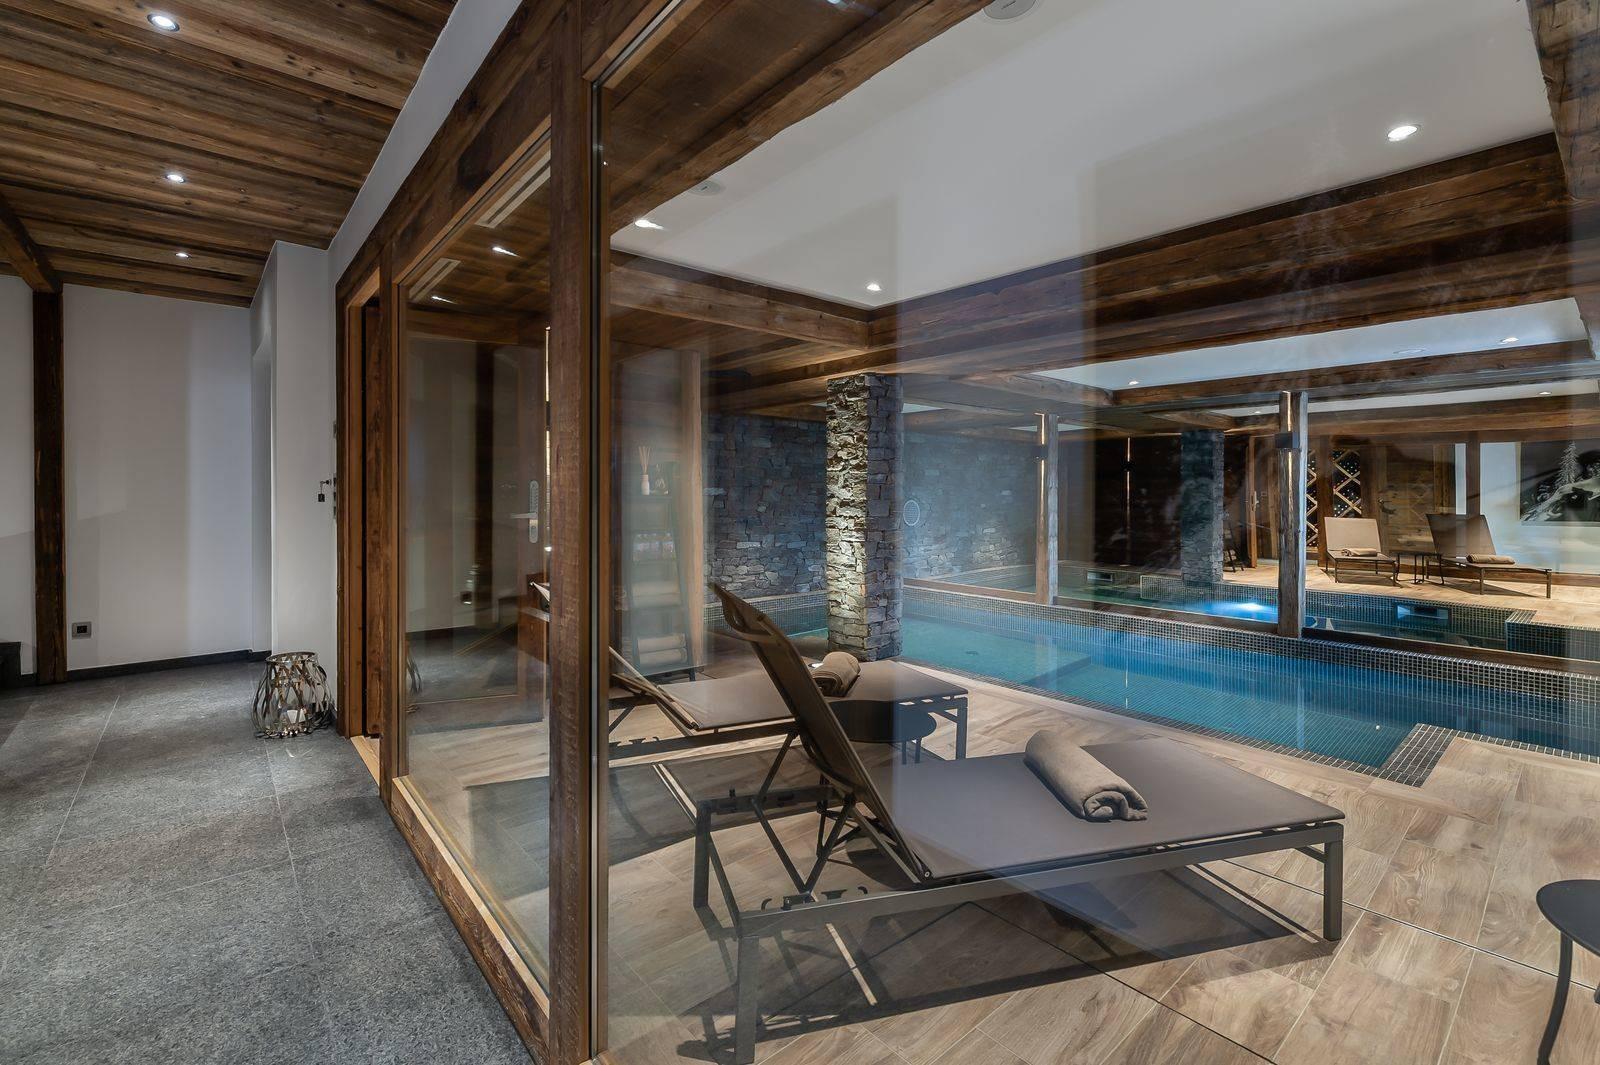 Saint Martin De Belleville Luxury Rental Chalet Ipaliu Pool 3